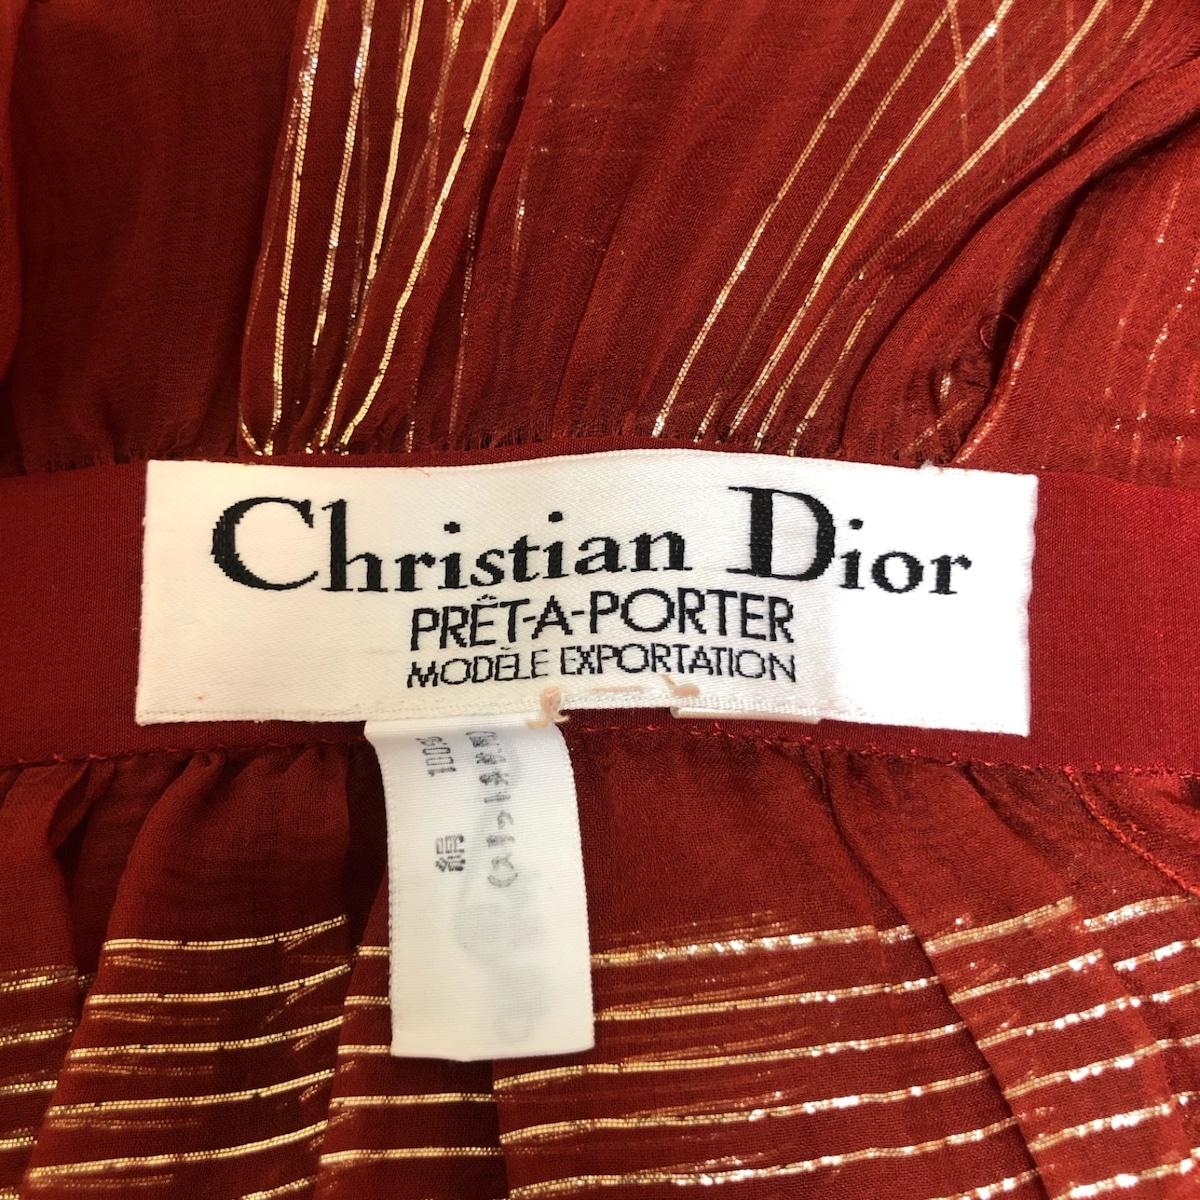 DIOR/ChristianDior(ディオール/クリスチャンディオール)のワンピース